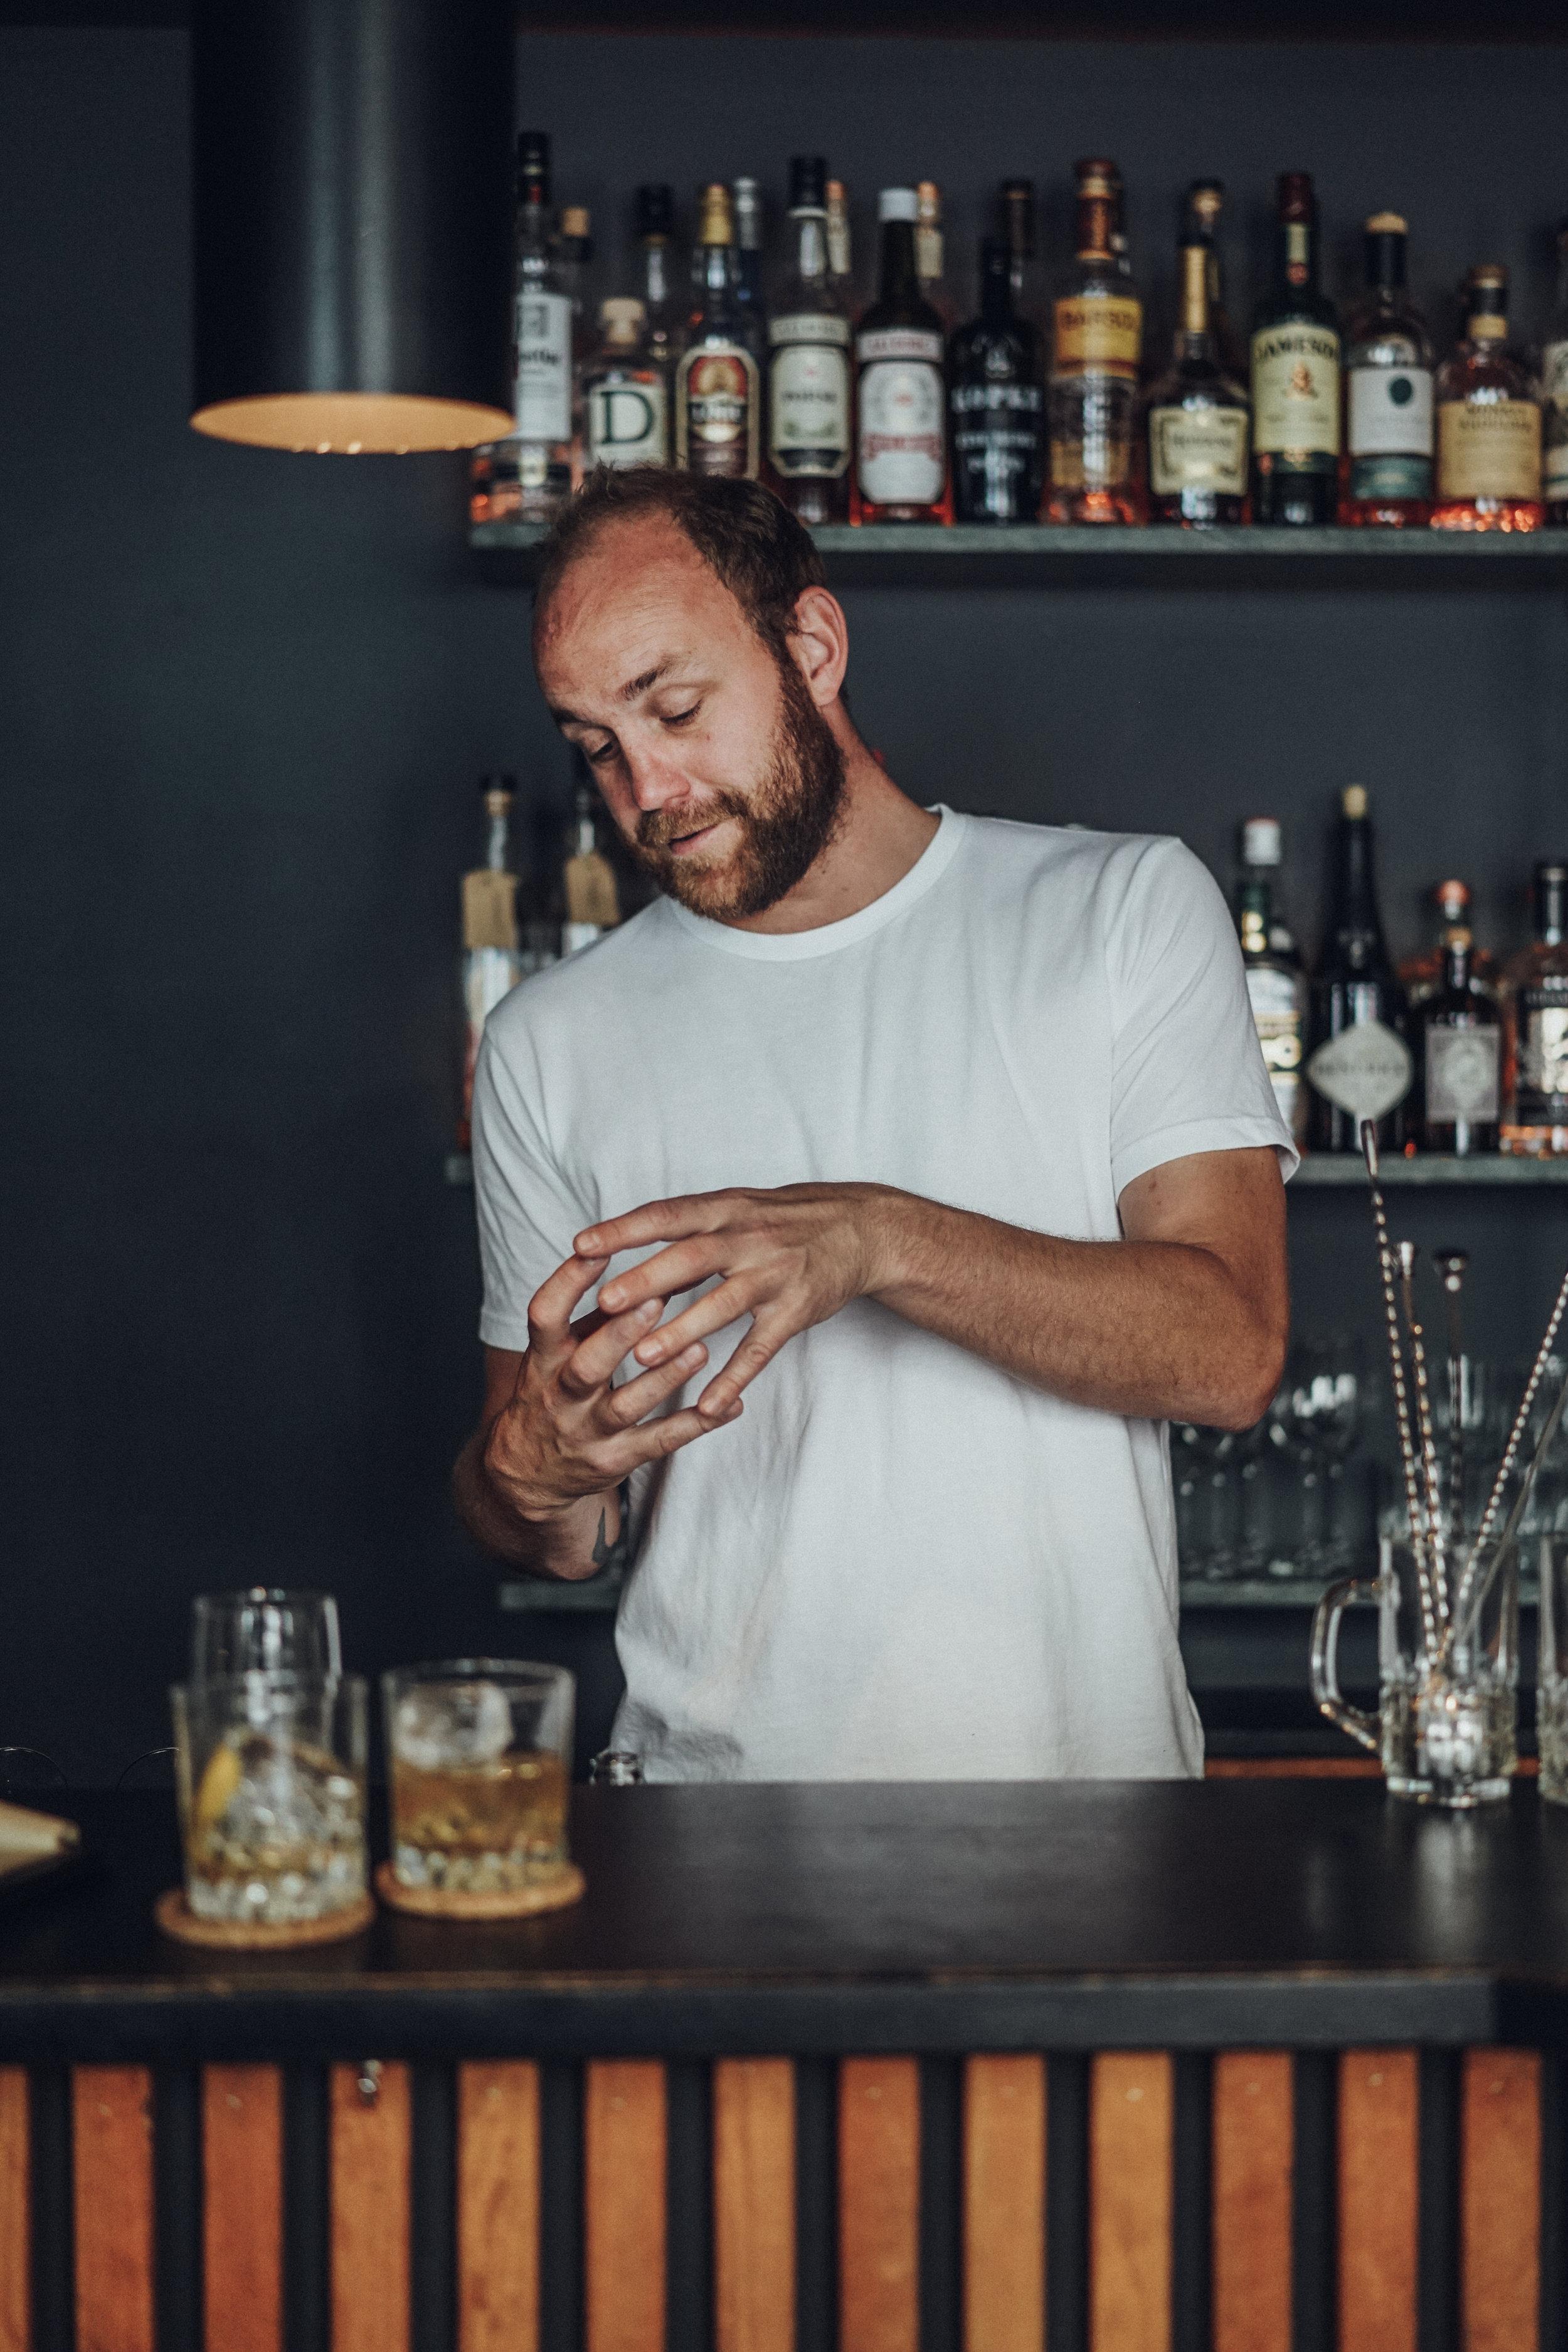 Kasper Riewe Henriksen behind the bar